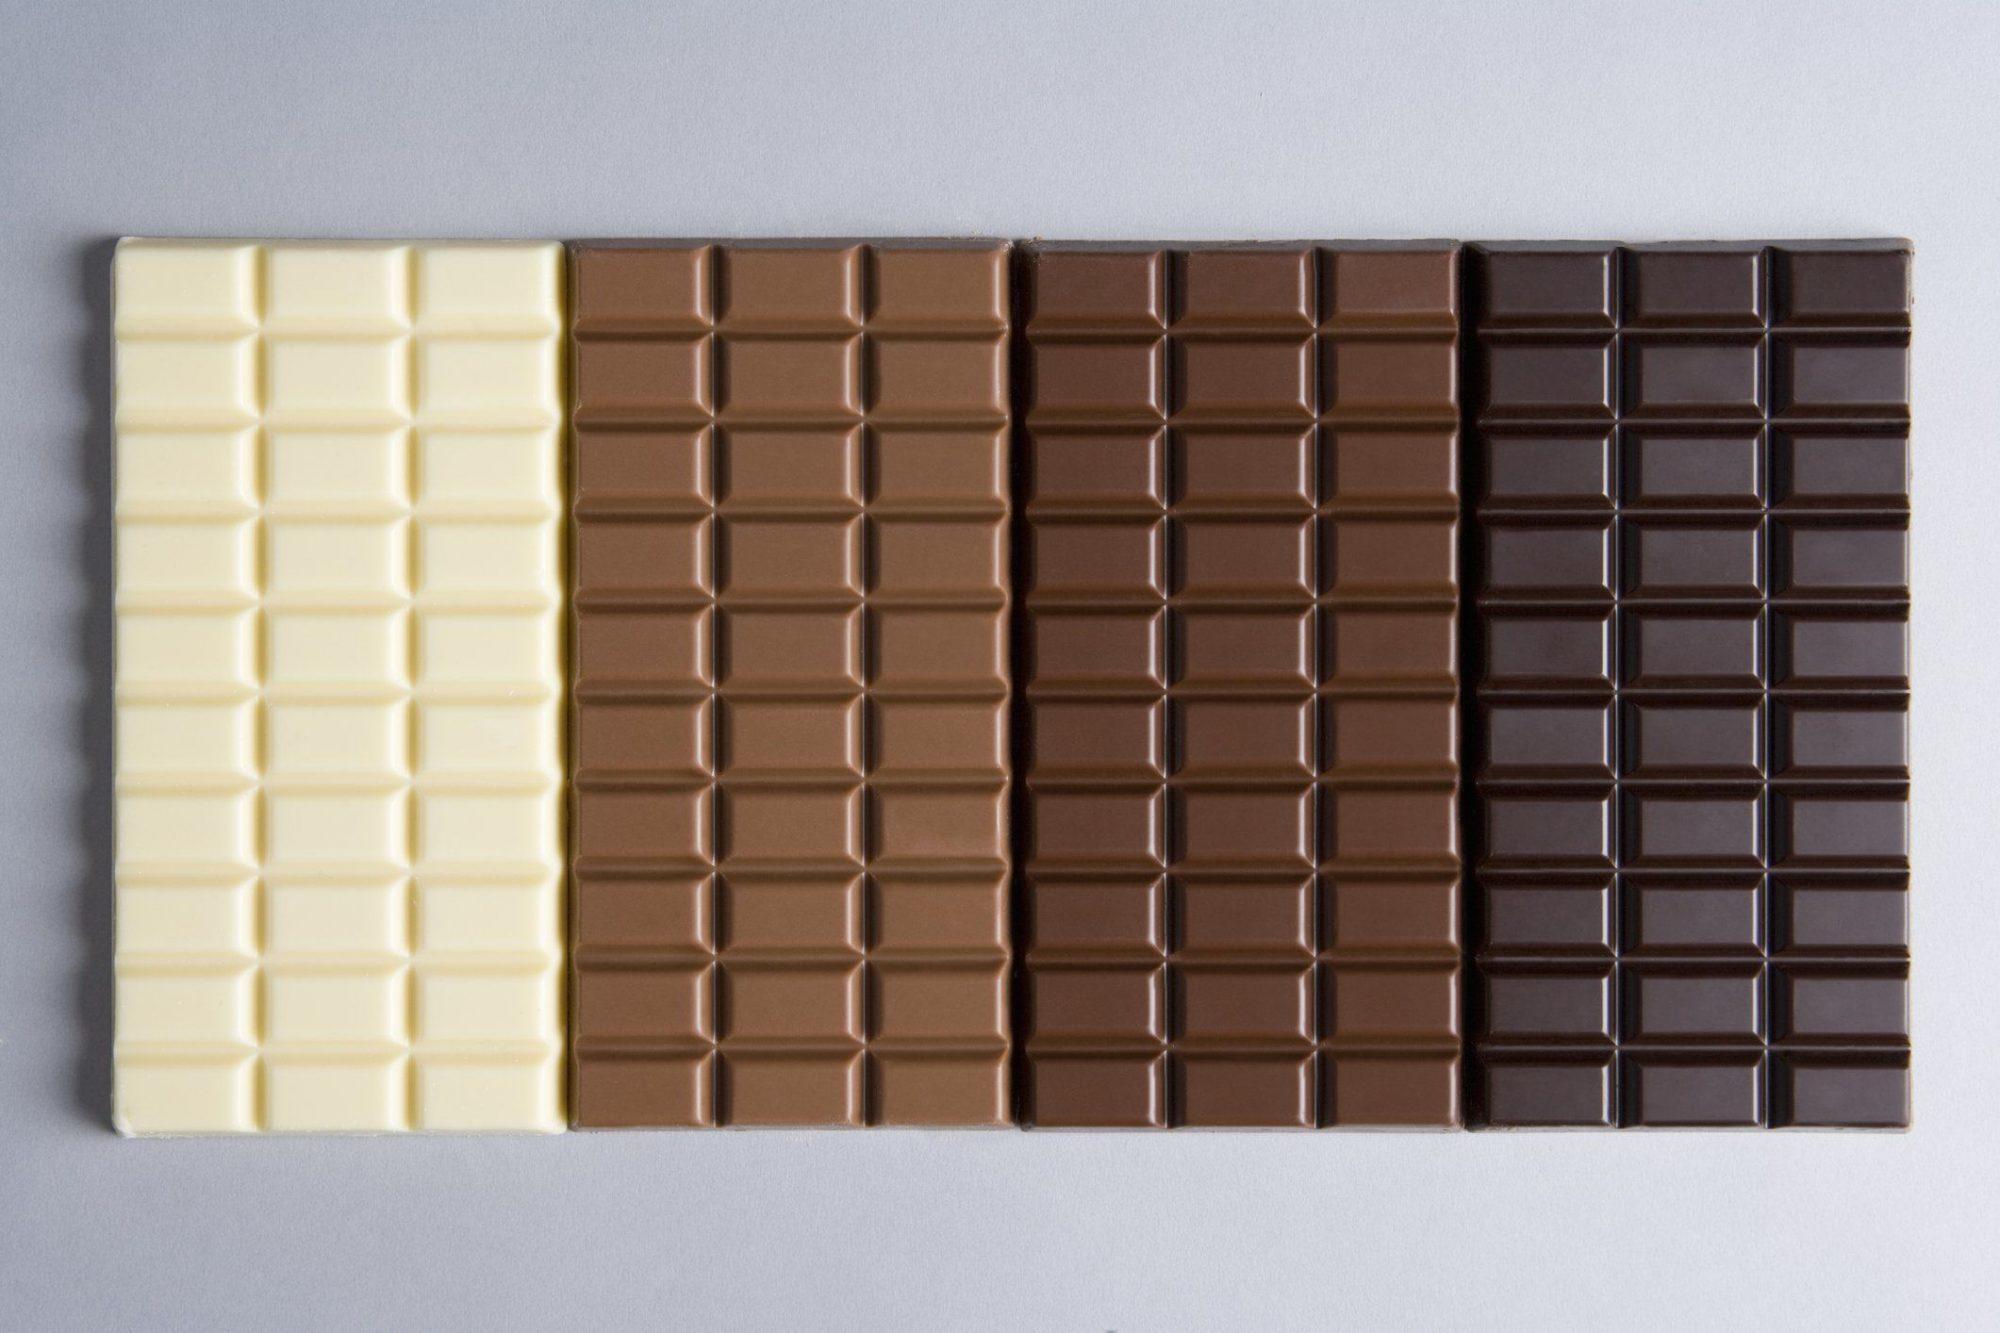 A row of chocolate bars